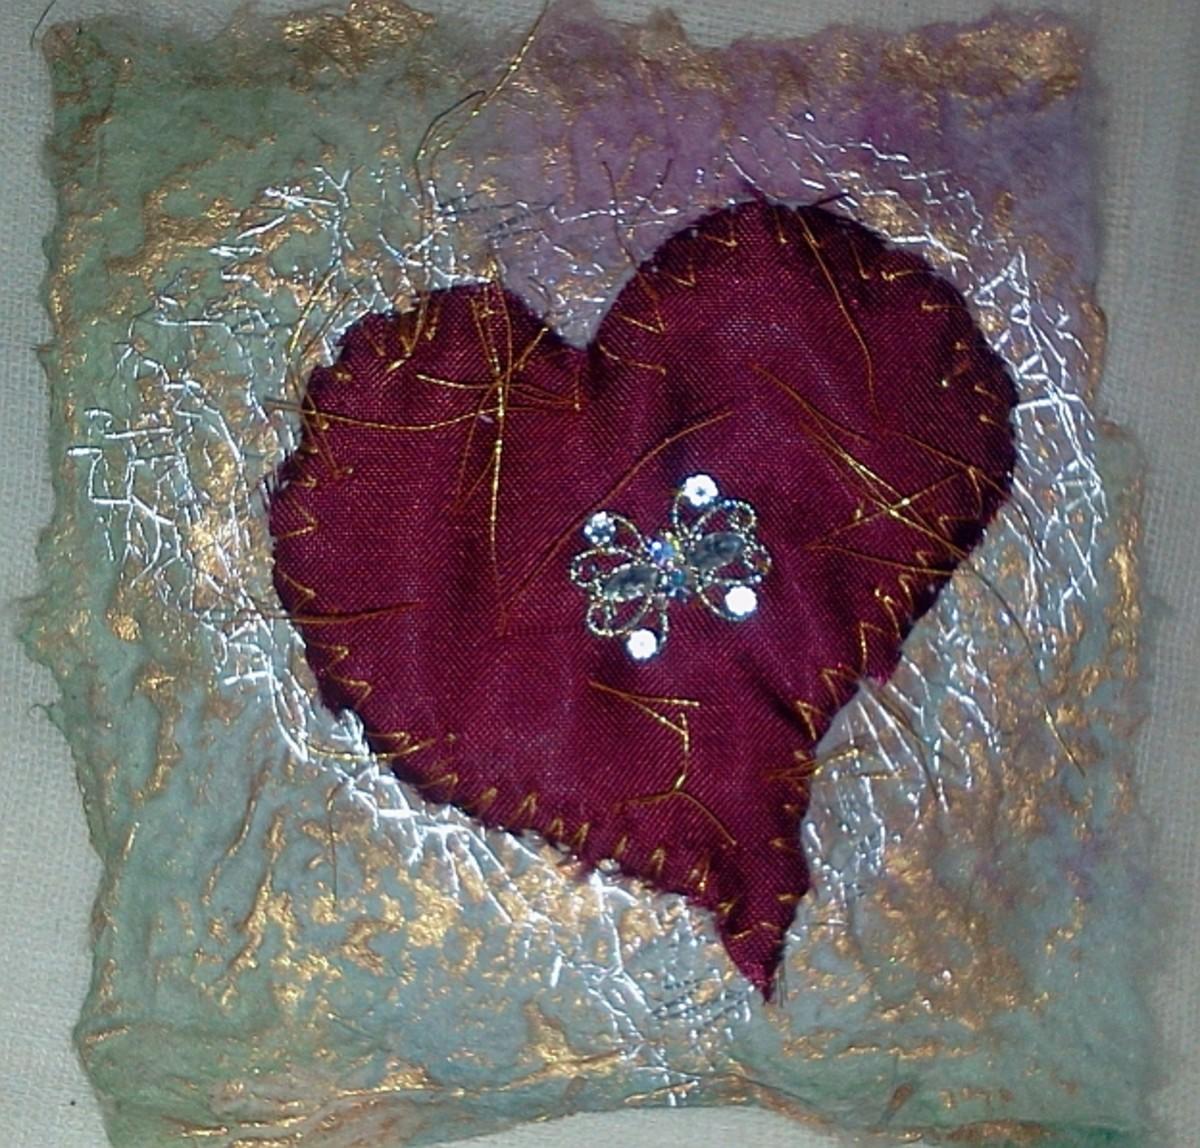 Silk and netting scraps sewn onto handmade paper.